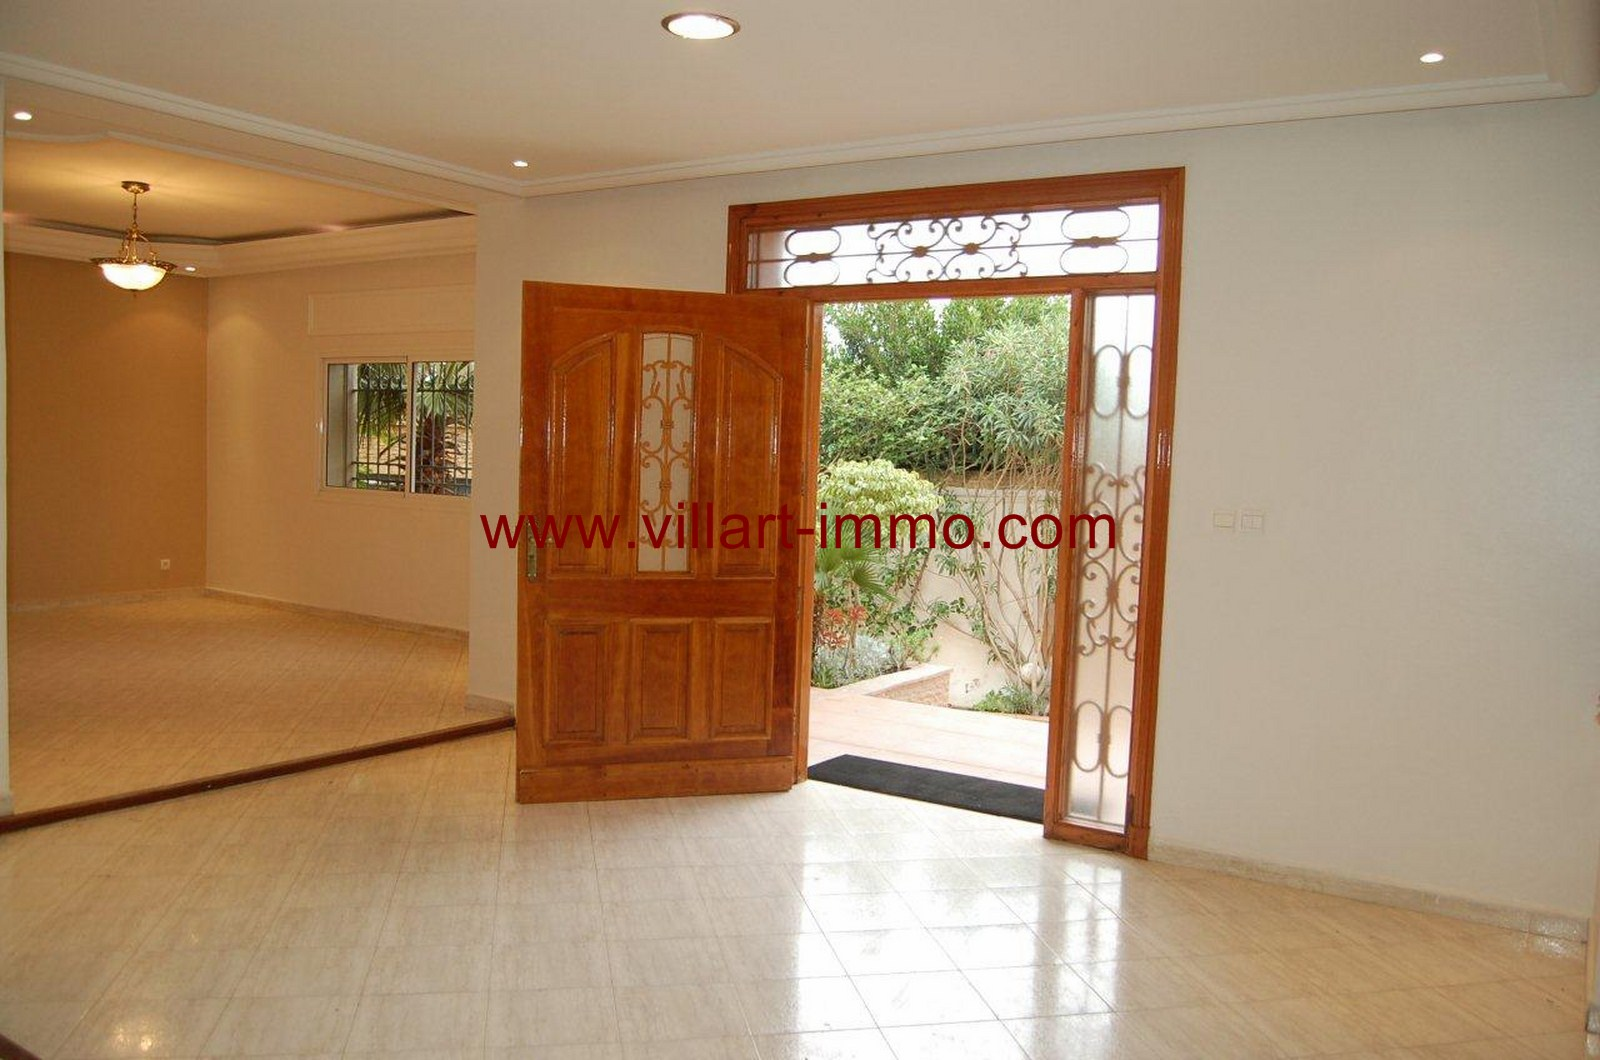 7-location-villa-non-meublee-malabata-tanger-entree-lv902-villart-immo